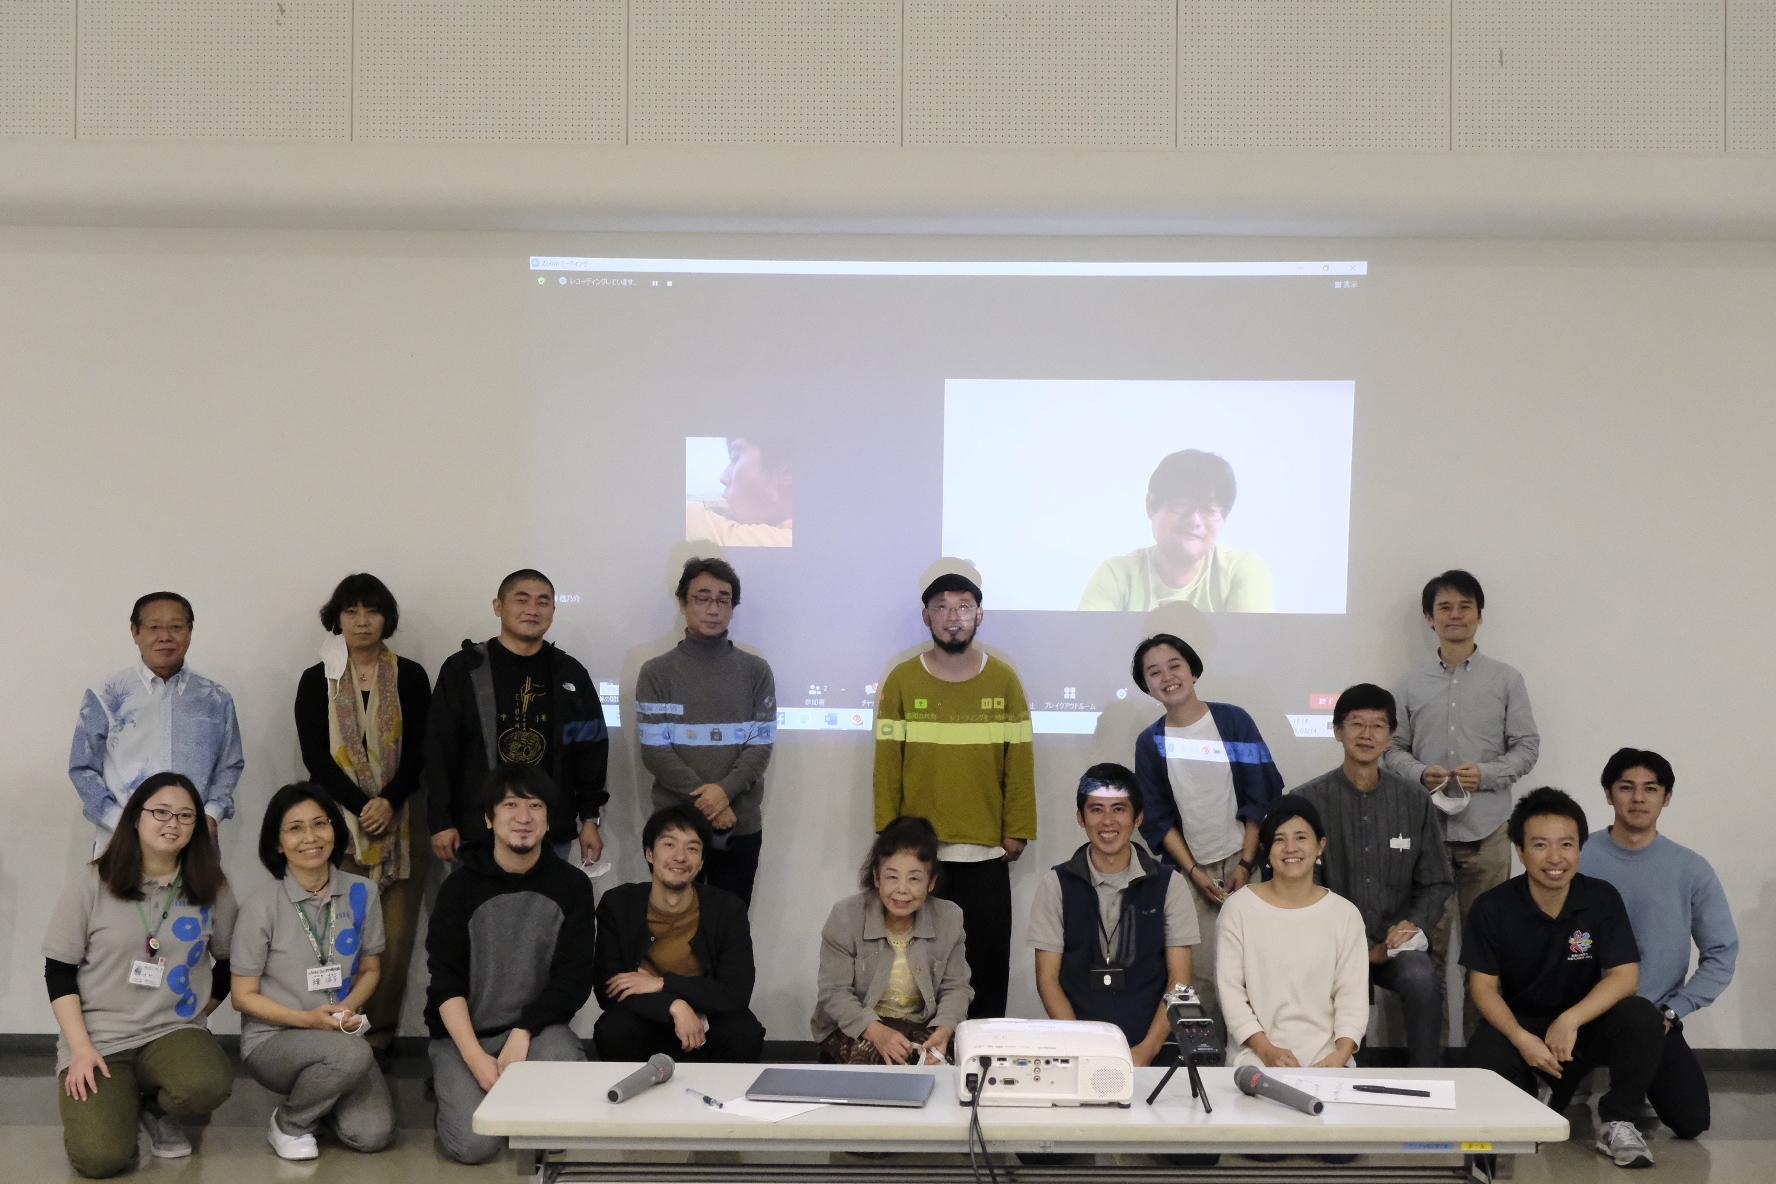 talk event 「しあさっての公民館を語る会」レポート_04